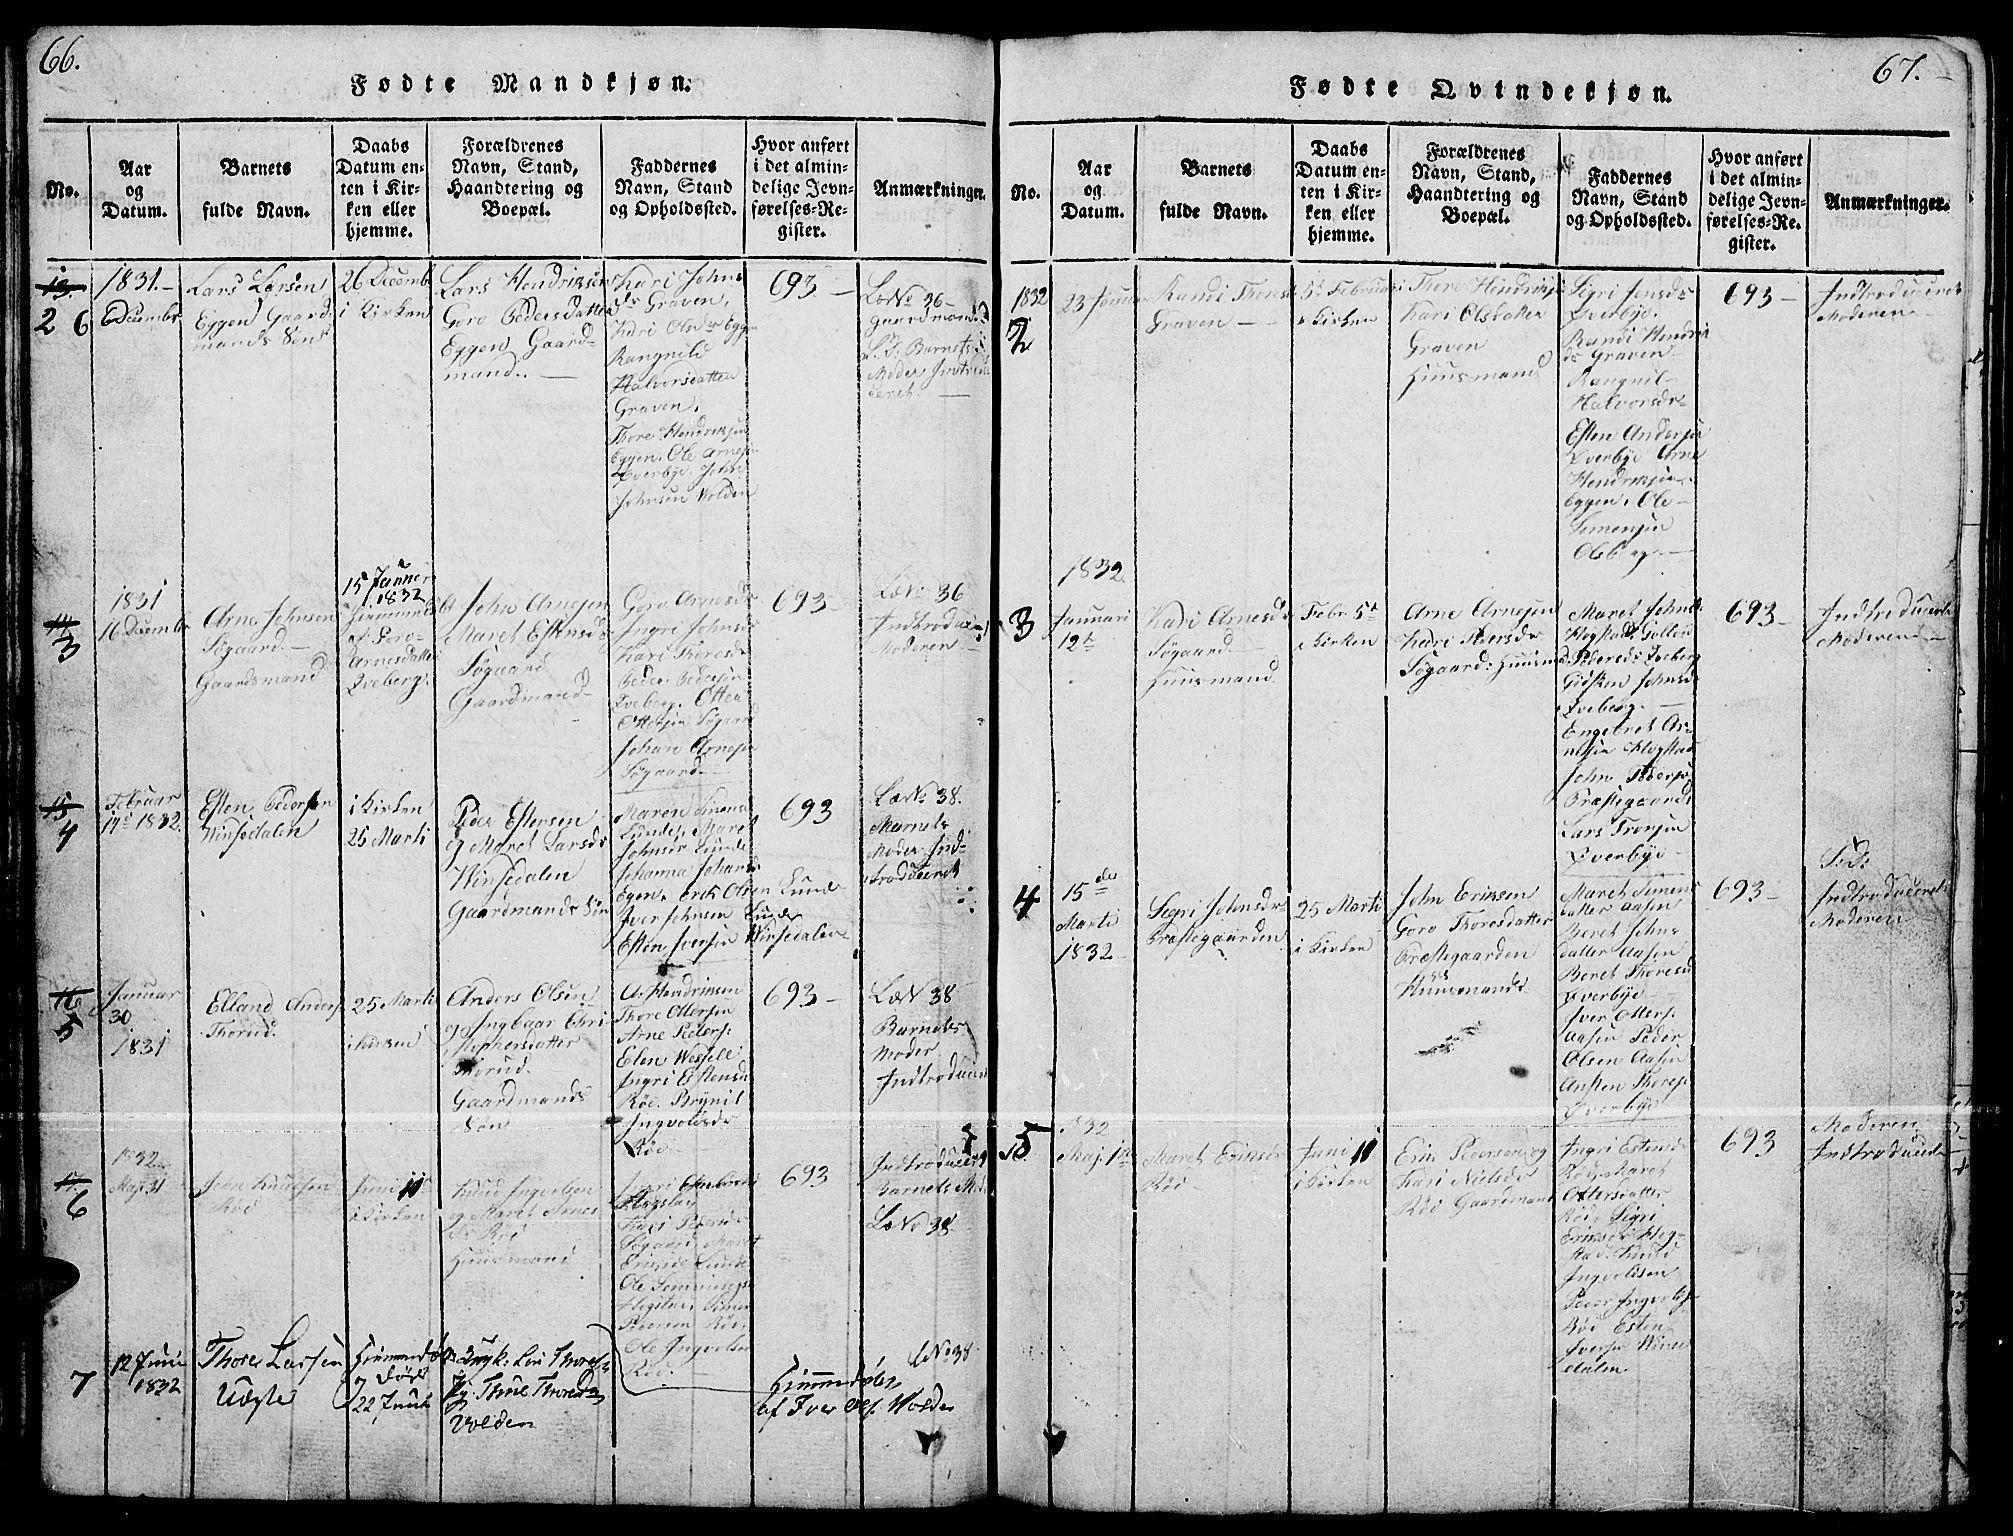 SAH, Tynset prestekontor, Klokkerbok nr. 4, 1814-1879, s. 66-67